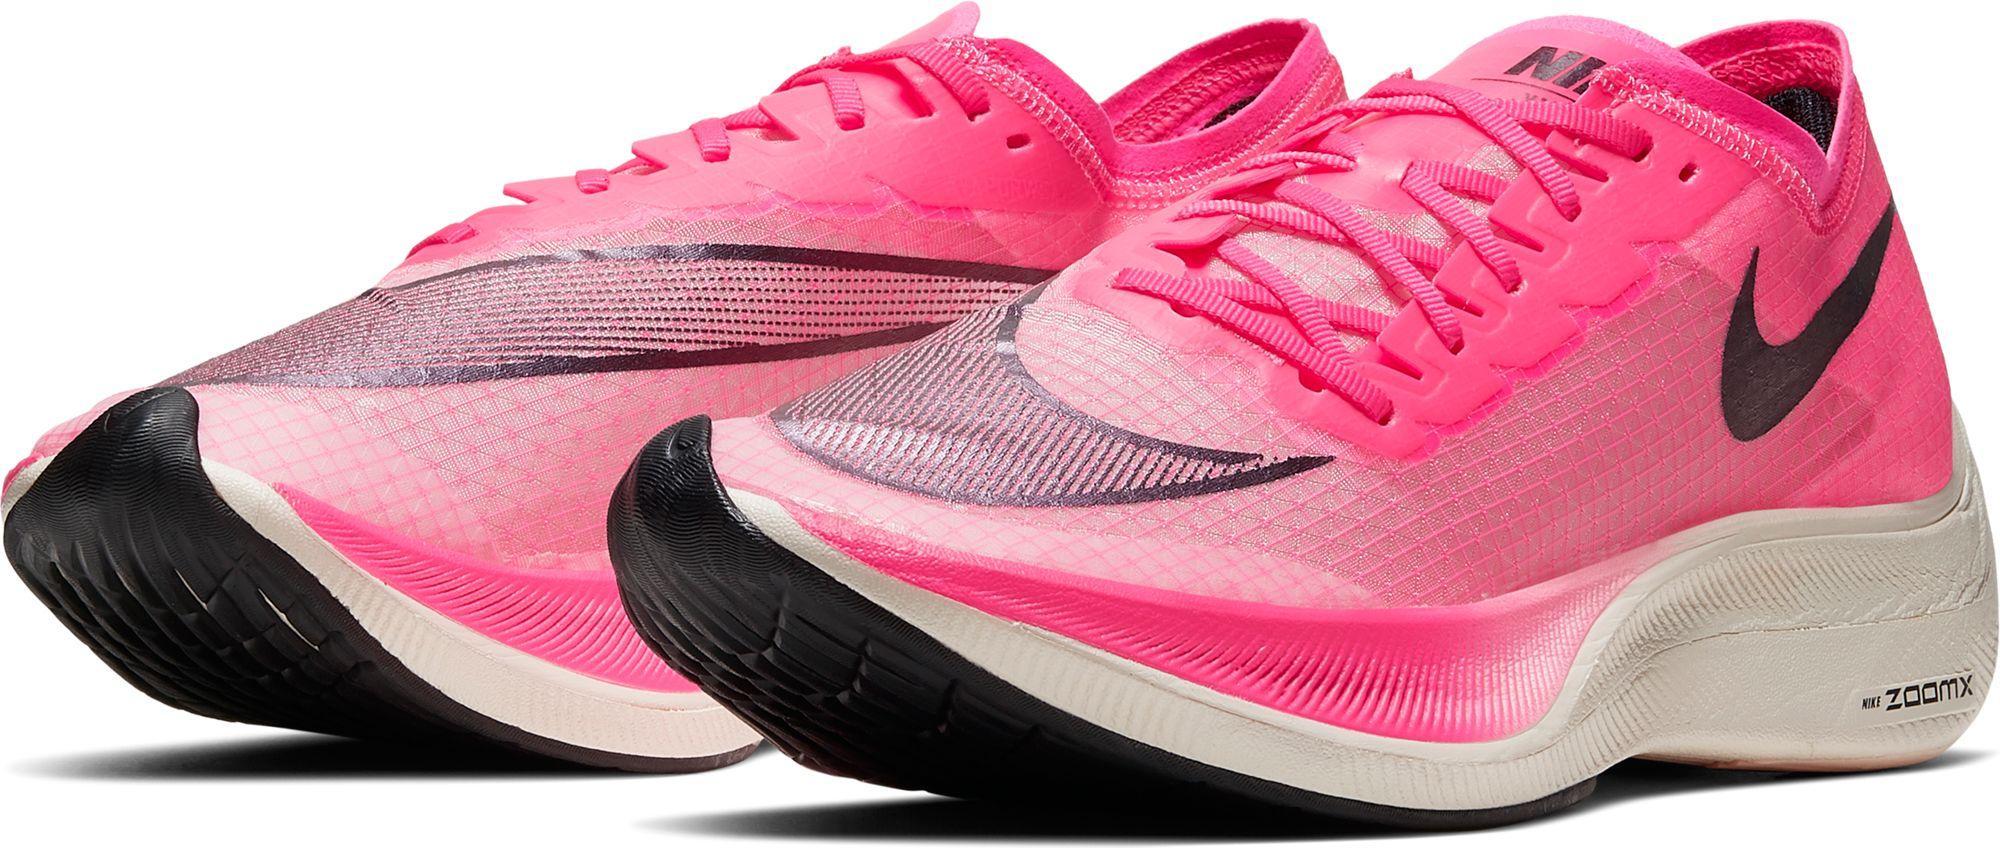 Zoomx Vaporfly Next% Running Shoe